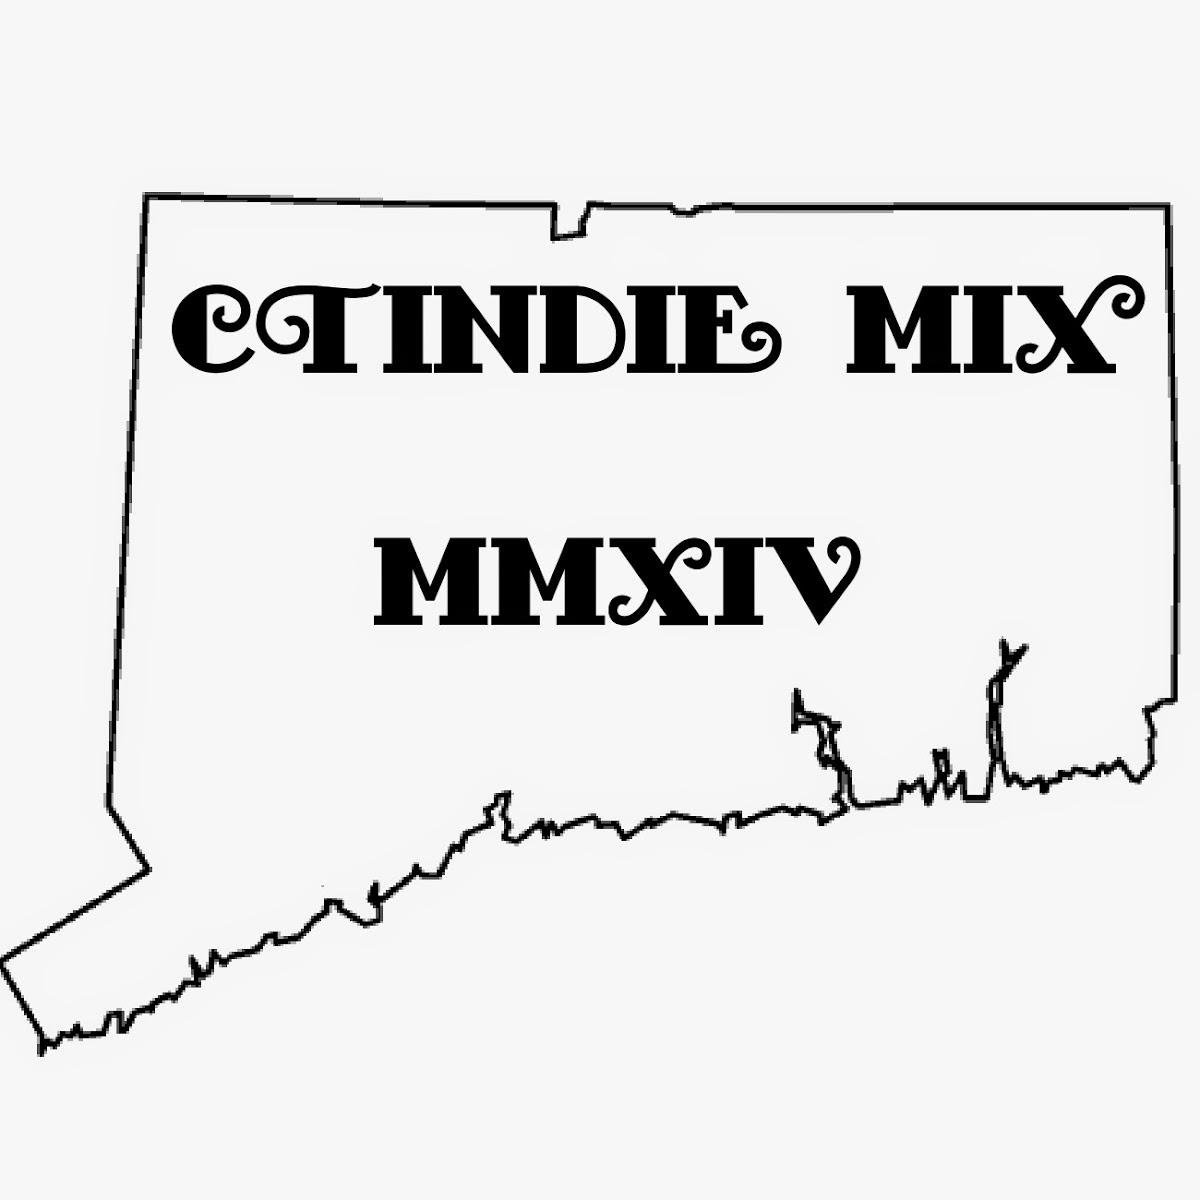 CTIndie Mix MMXIV